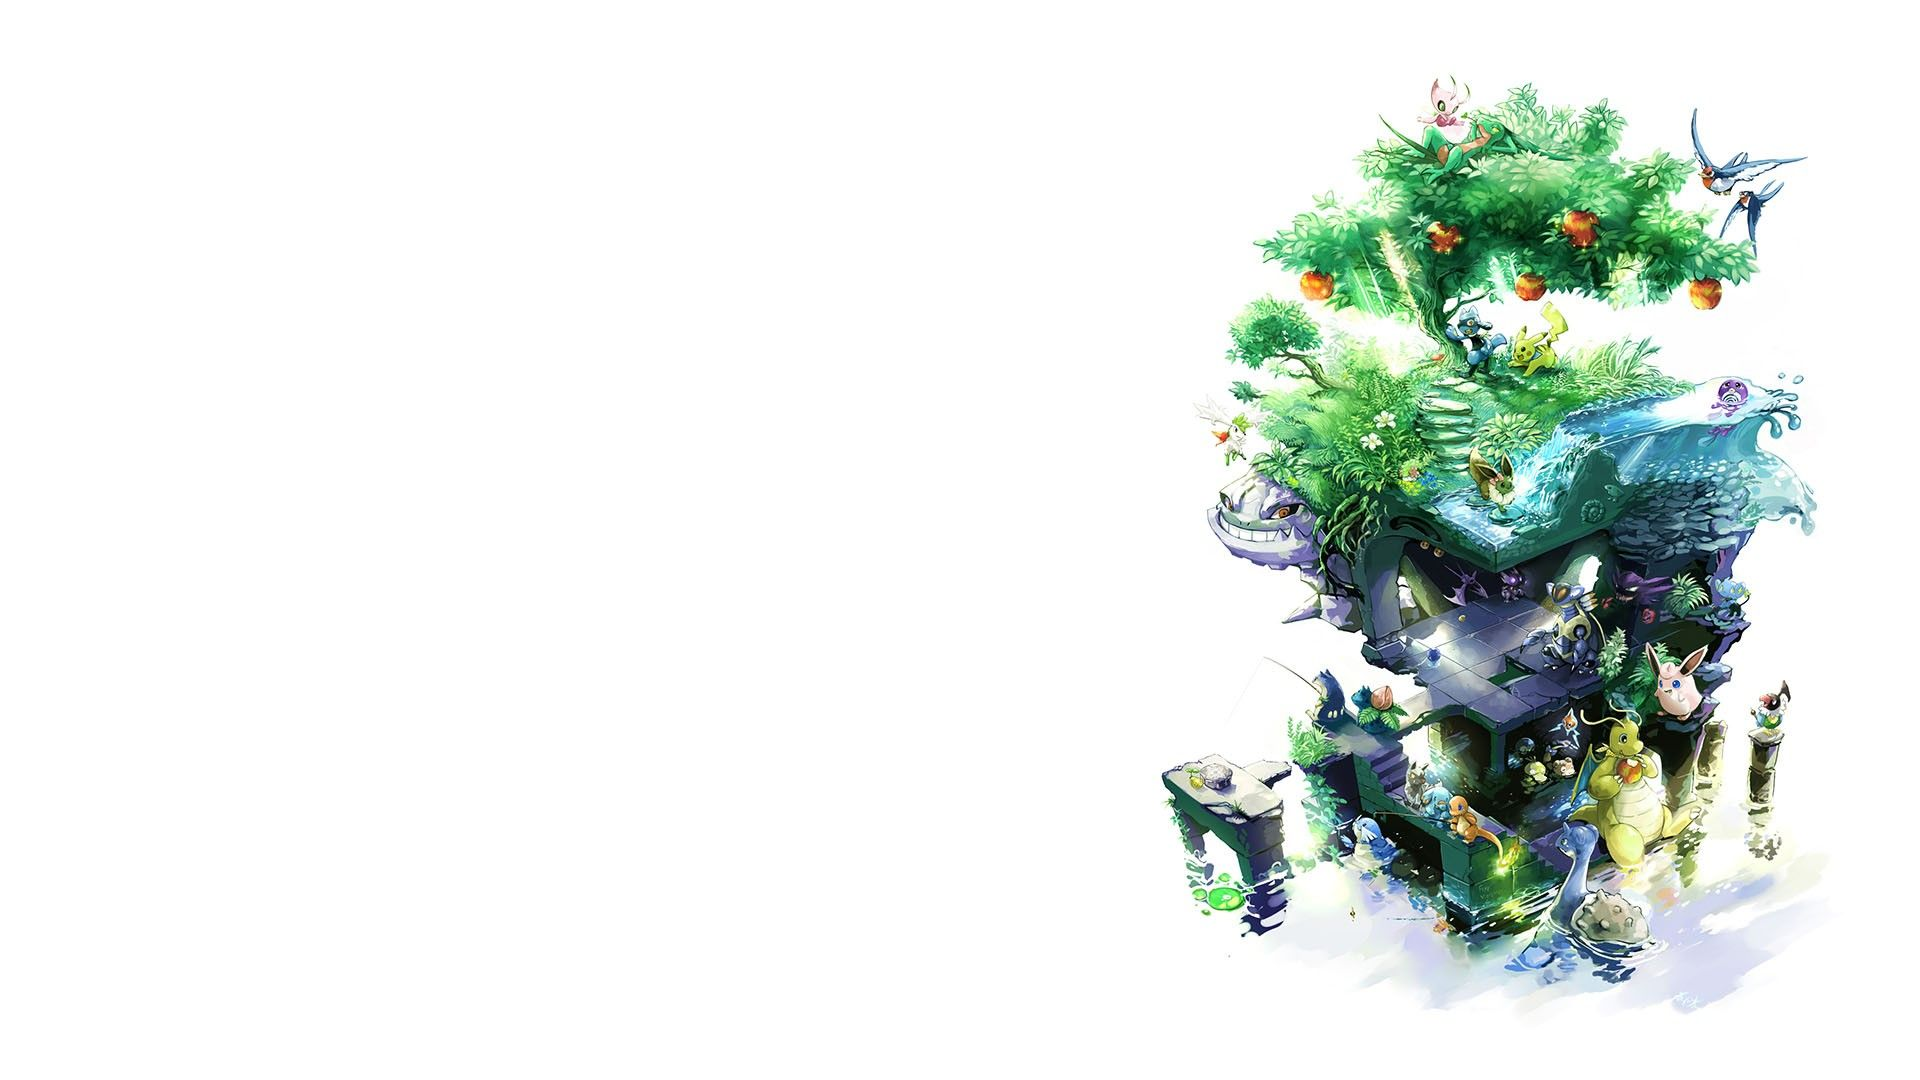 1920x1080 Pokemon Tree White Background Hd Wallpapers 1080p White Background Hd Background Hd Wallpaper Hd Wallpapers 1080p